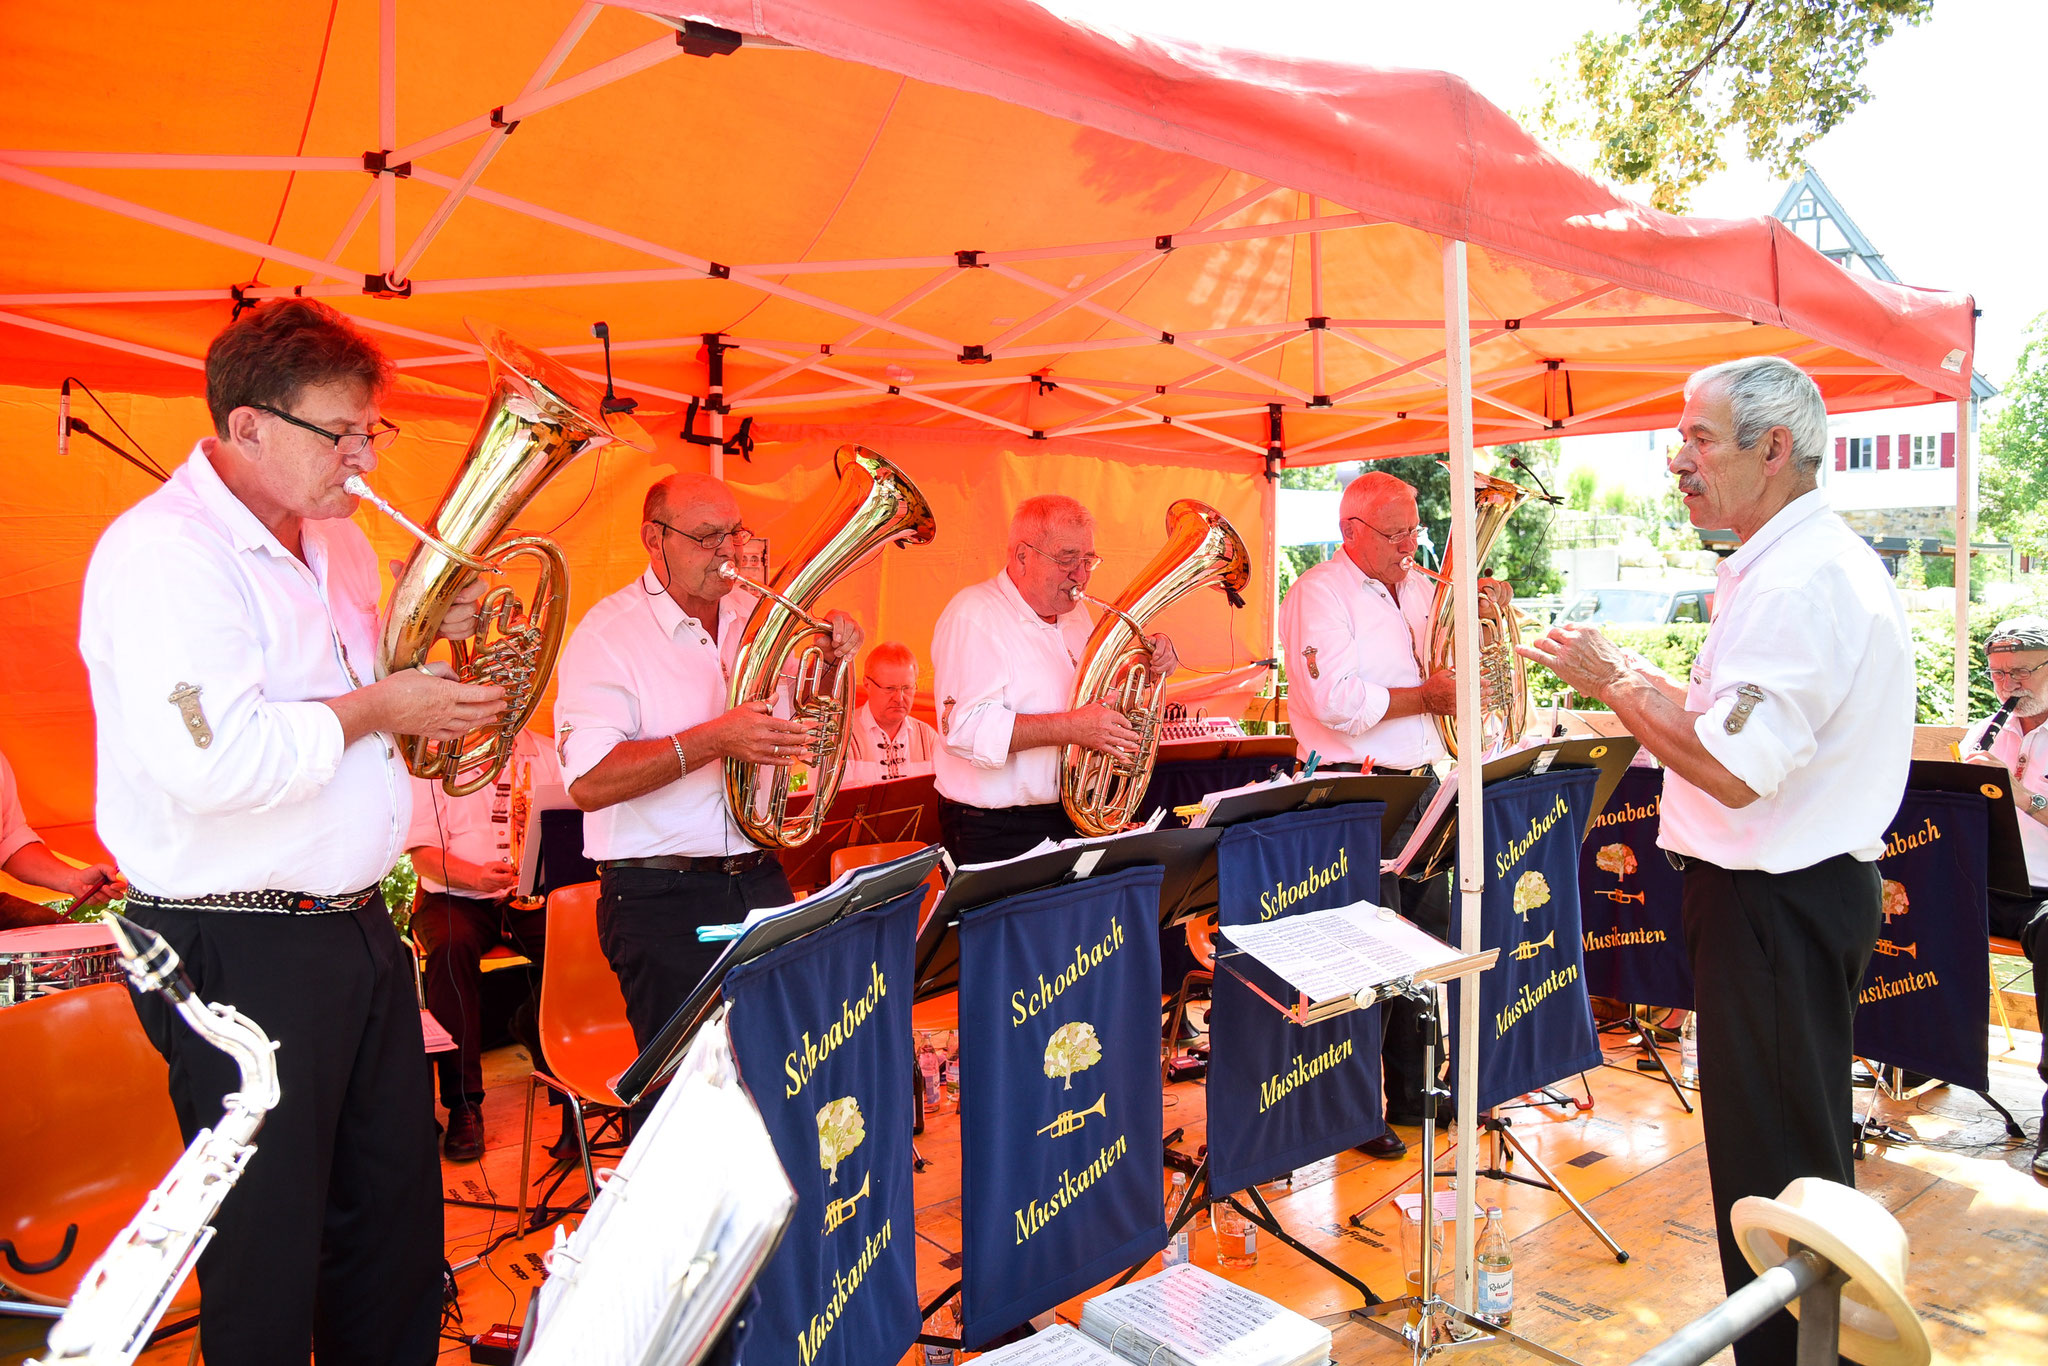 Bachfest TVA Altdorf 08.07.2018